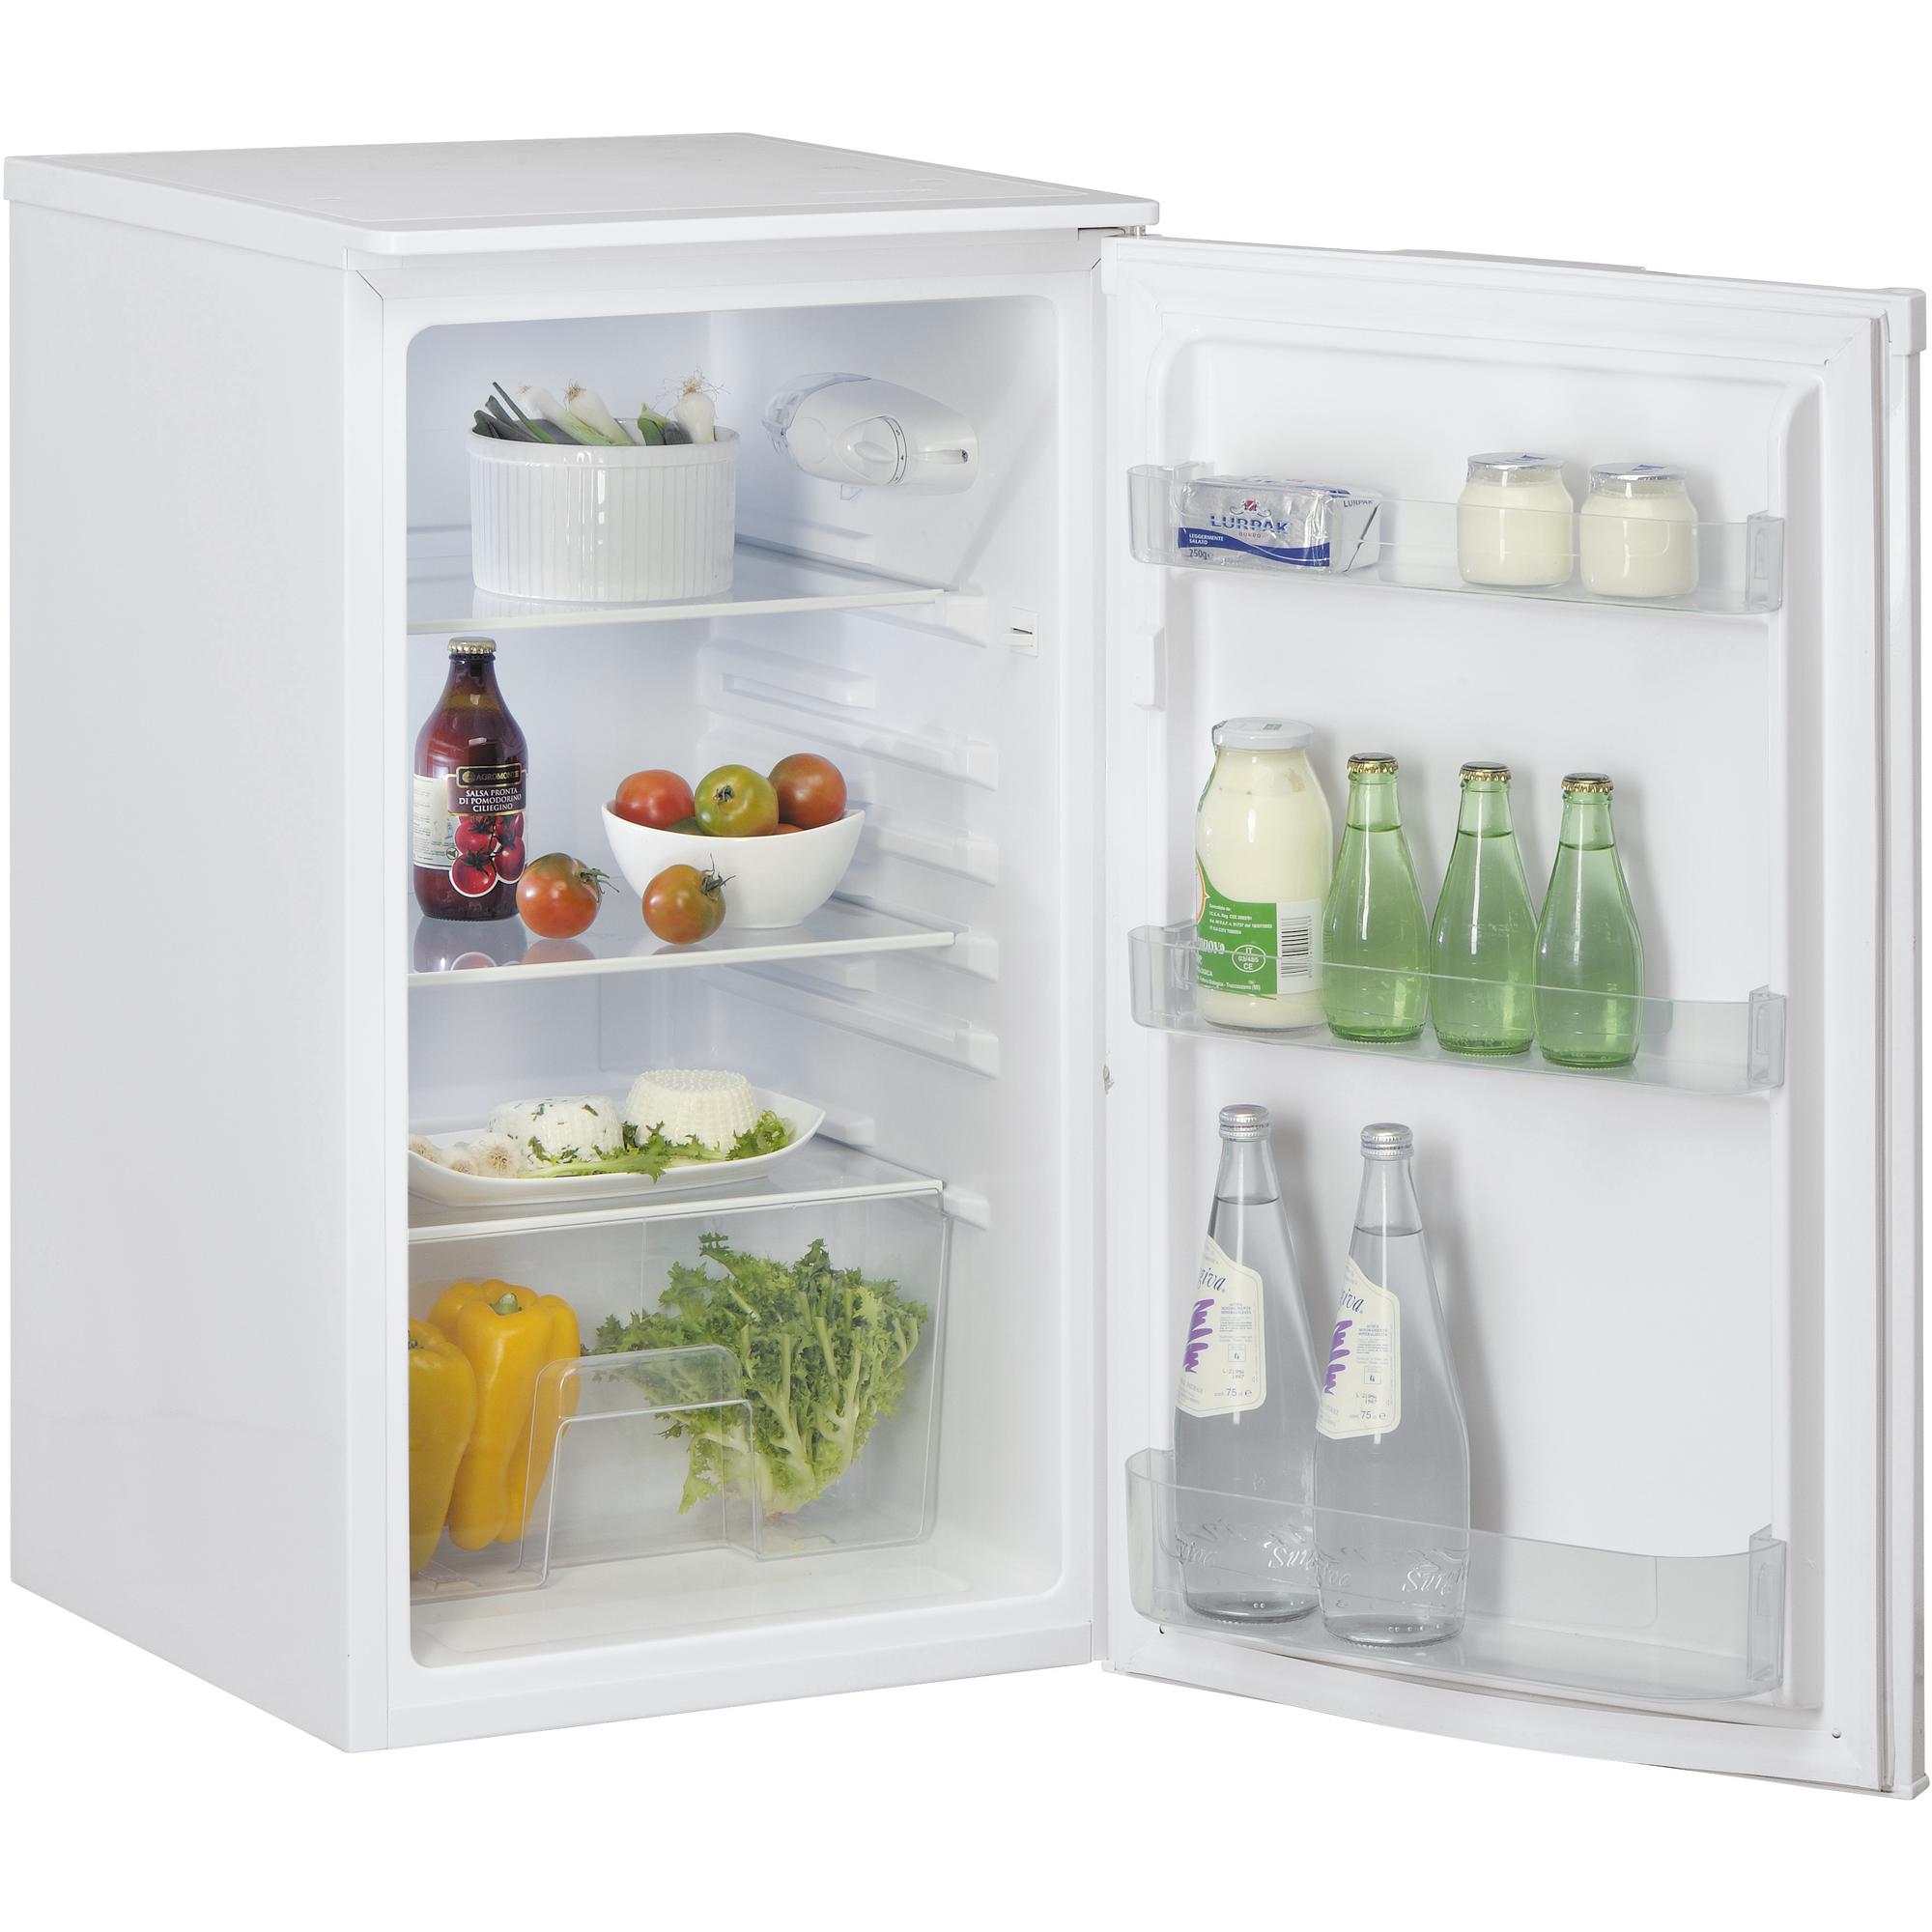 larder fridge whirlpool larder fridge rh larderfridgewosuriga blogspot com